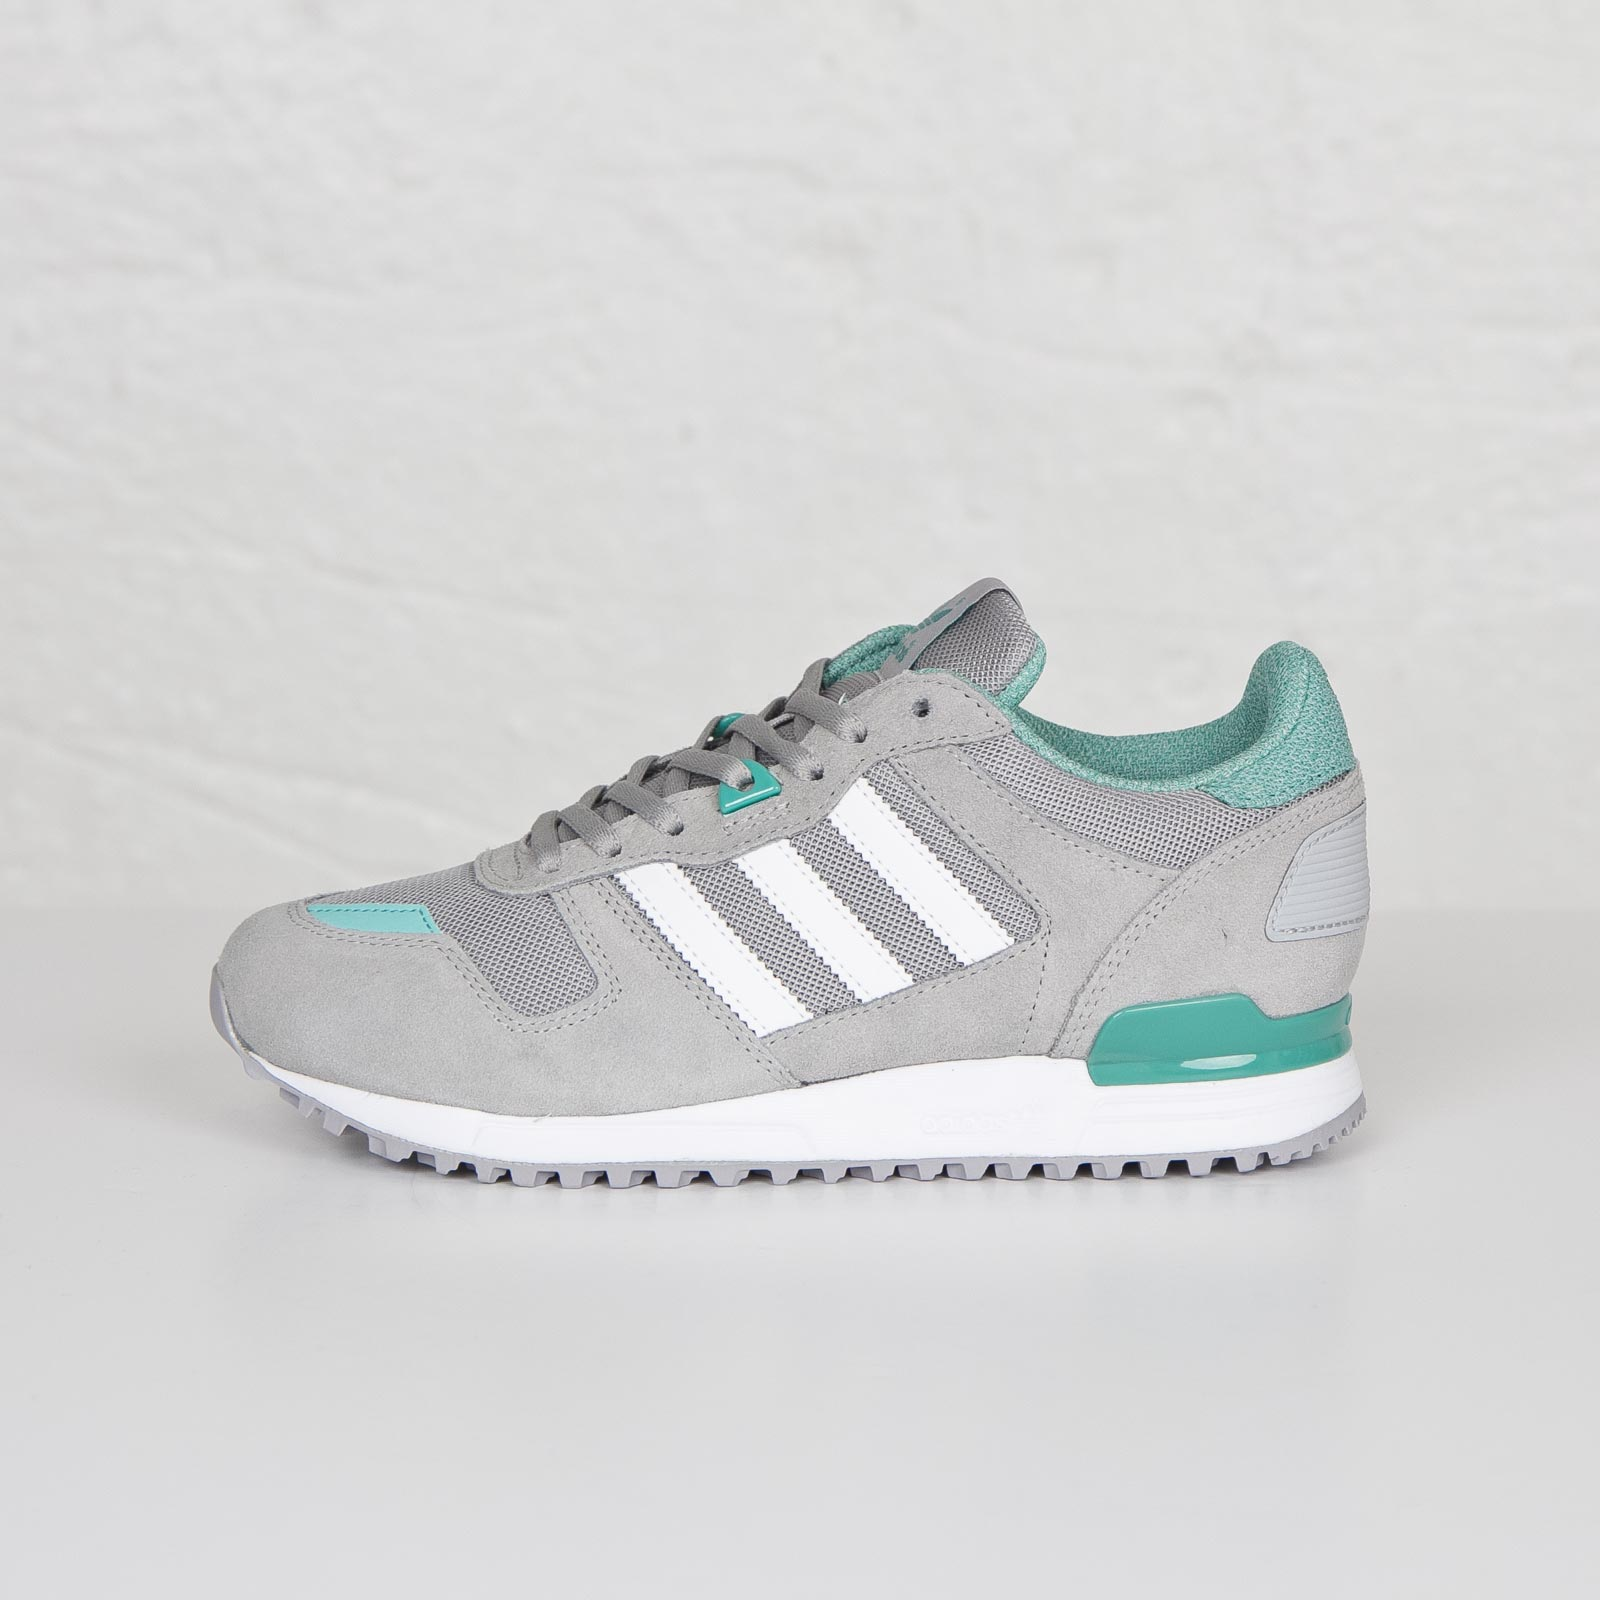 adidas zx 700 w dames